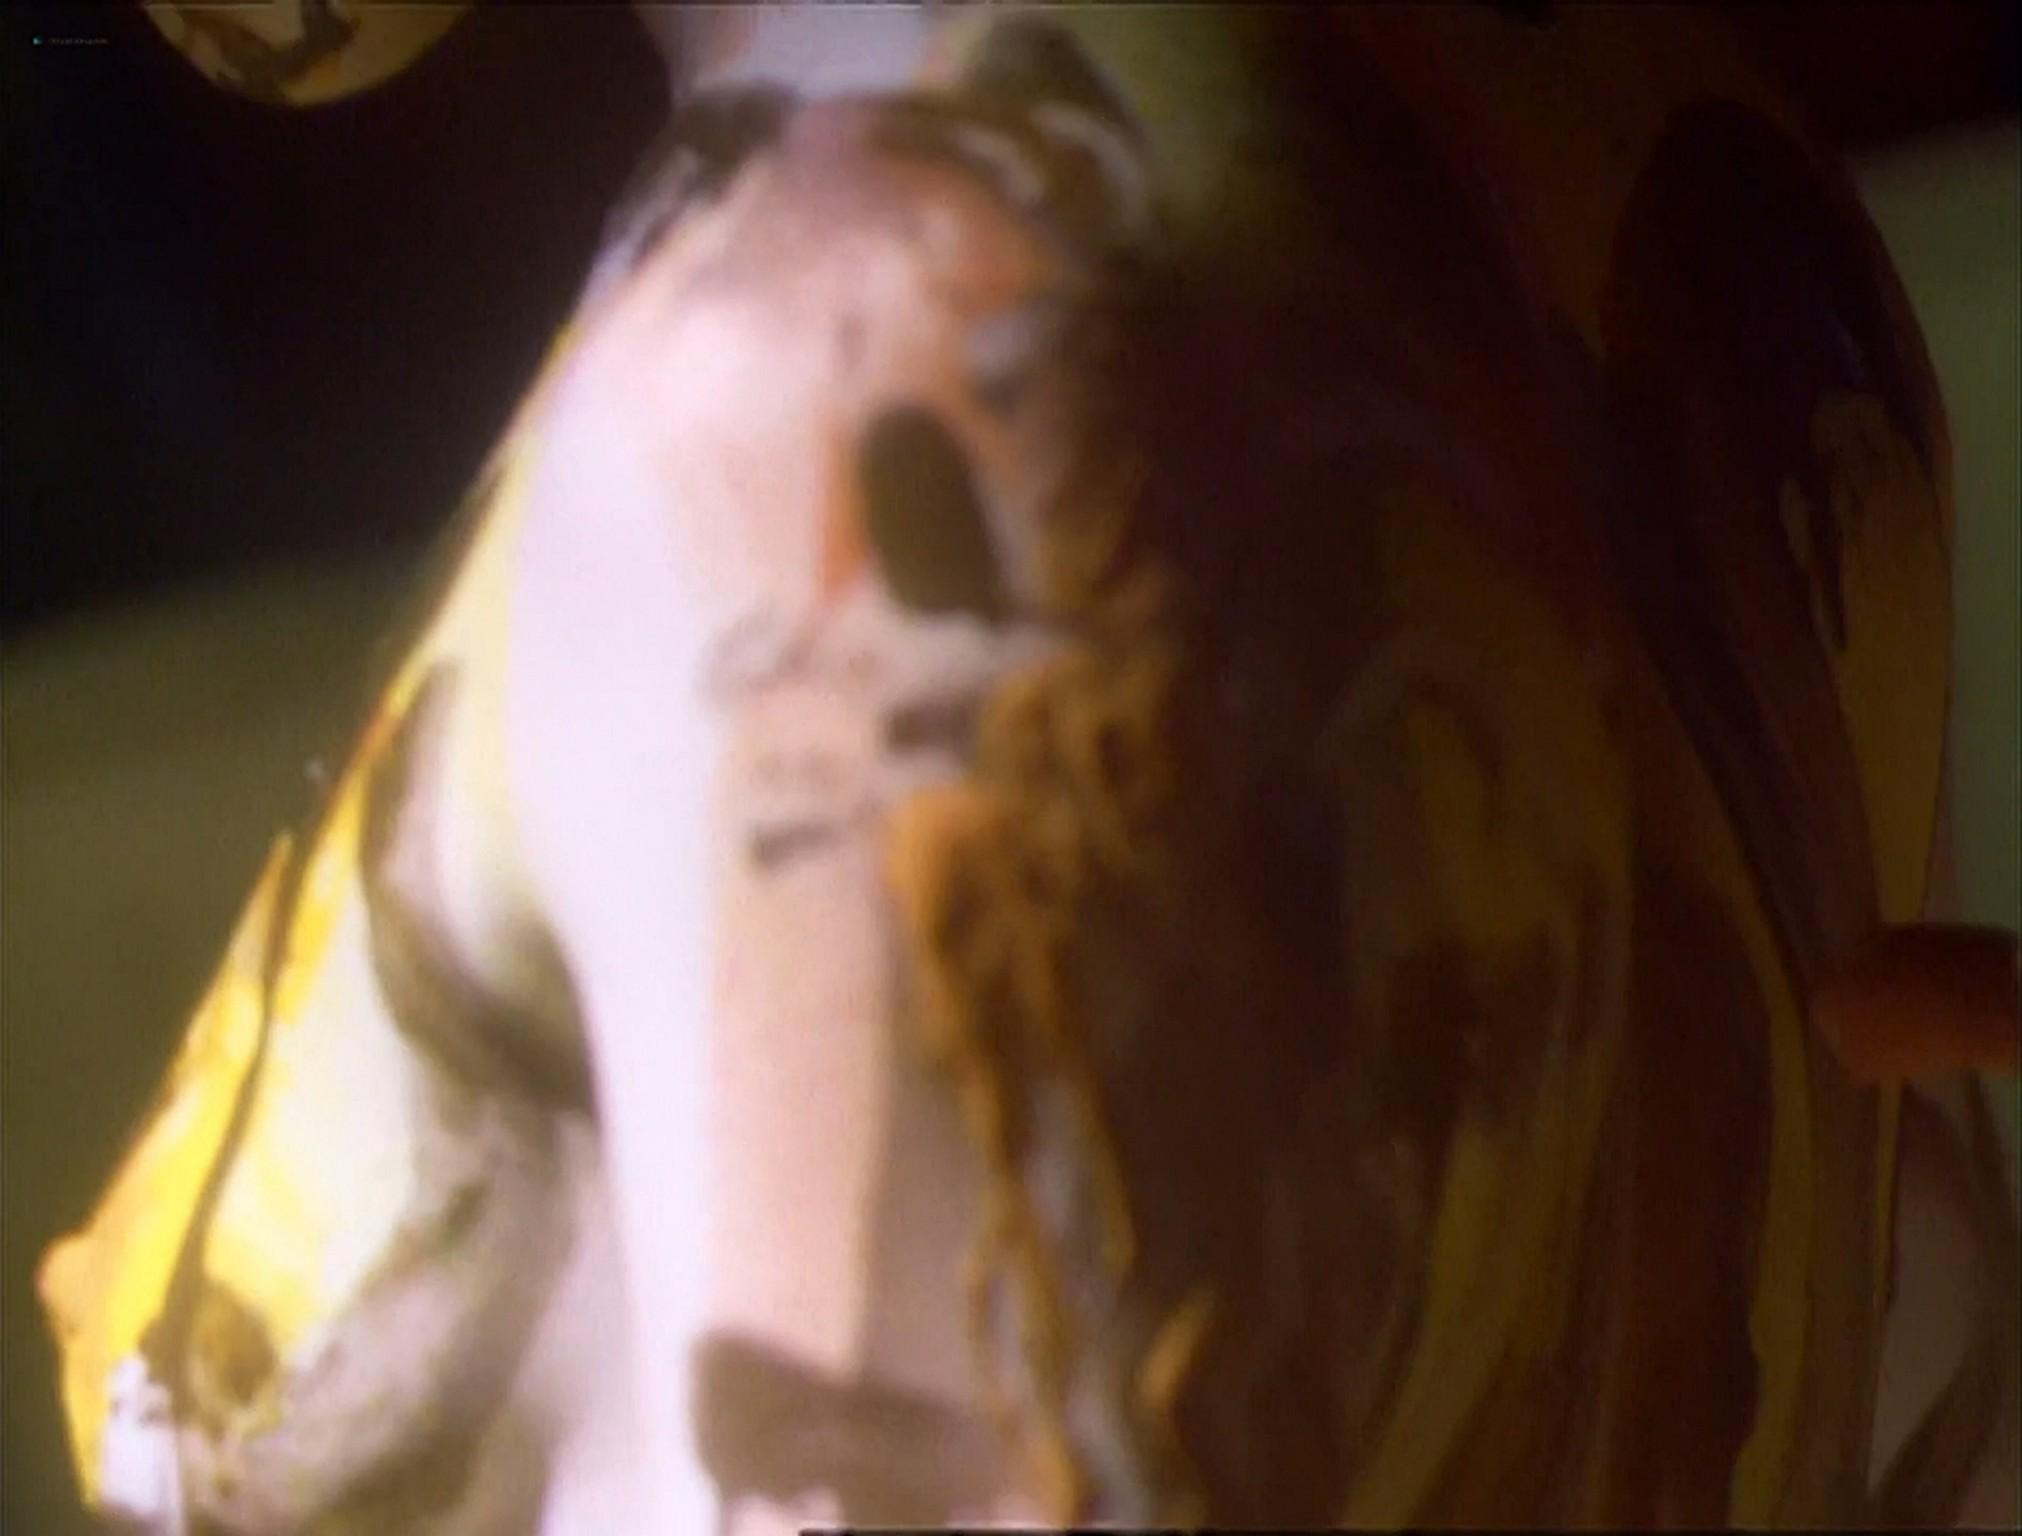 Christina Cox nude bush lesbian sex with Karyn Dwyer nude too Better than Chocolate 1999 HD 720p WEB DL 4